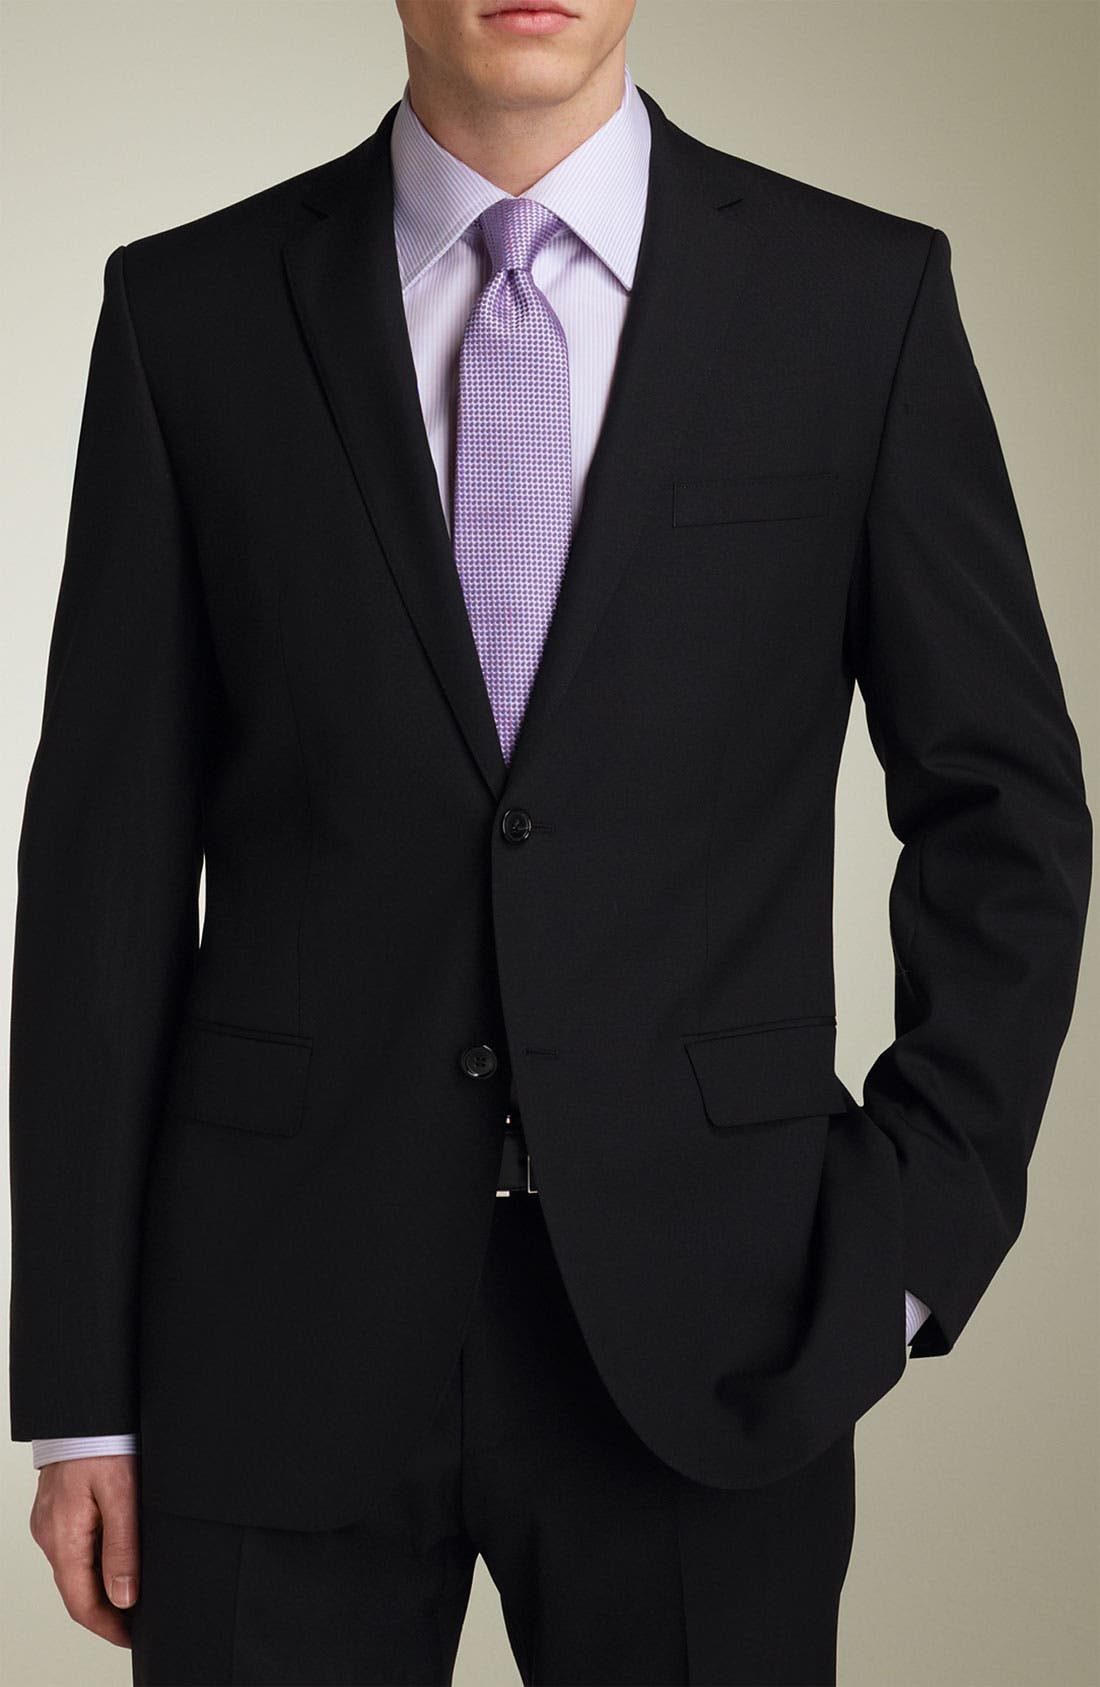 Alternate Image 1 Selected - BOSS 'Jam/Sharp' Trim Fit Black Virgin Wool Suit